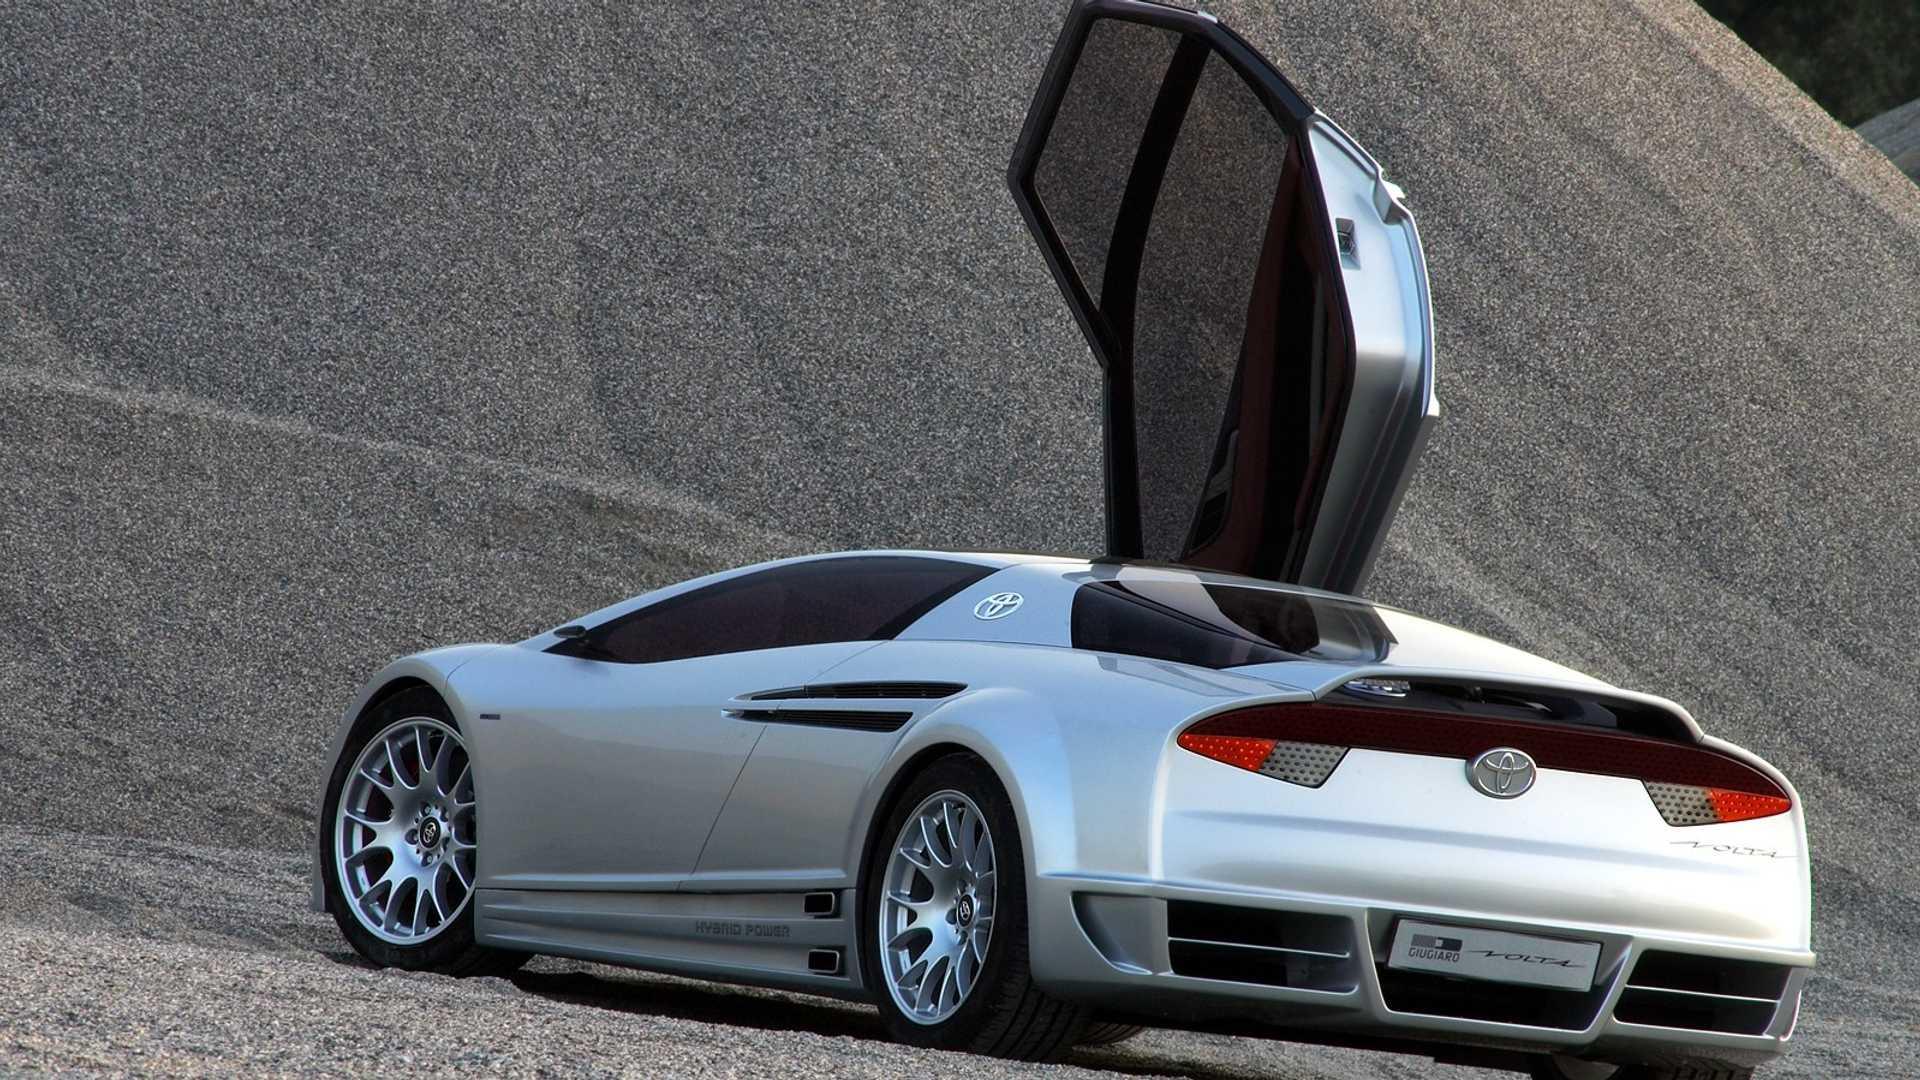 Toyota-Alessandro-Volta-concept-2004-21